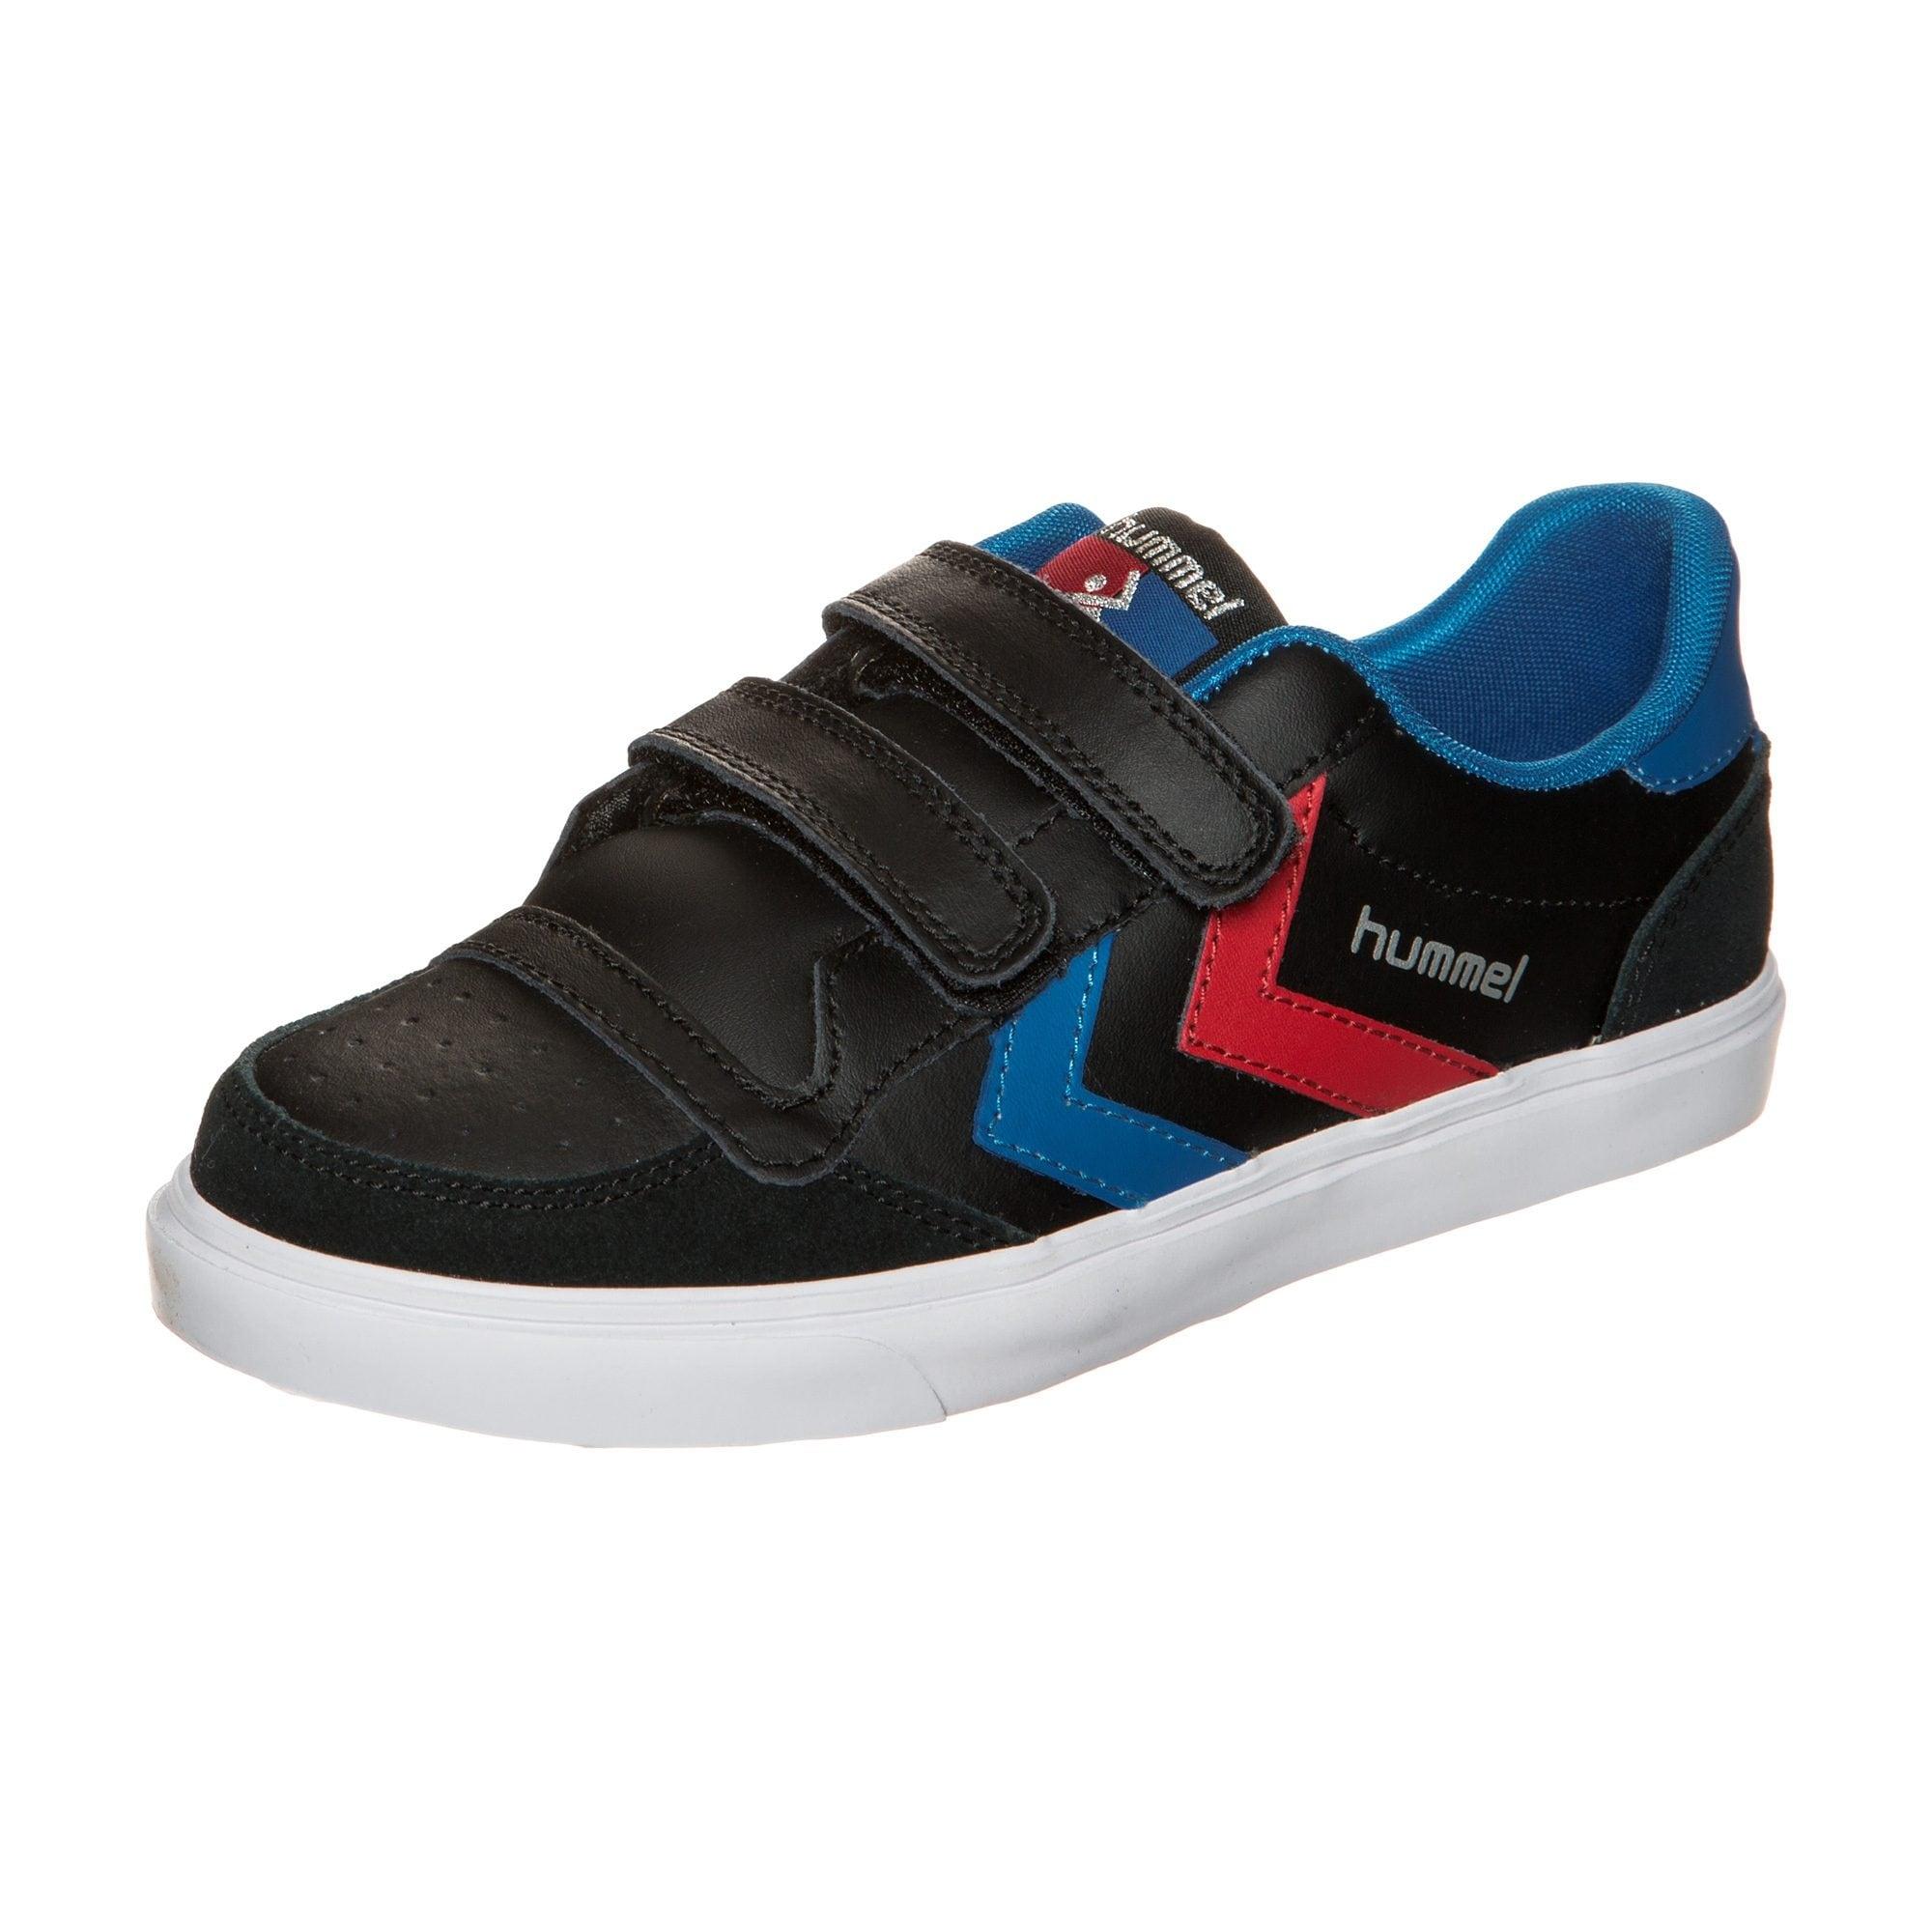 Hummel Stadil Leather Low Sneaker Kinder Preisvergleich